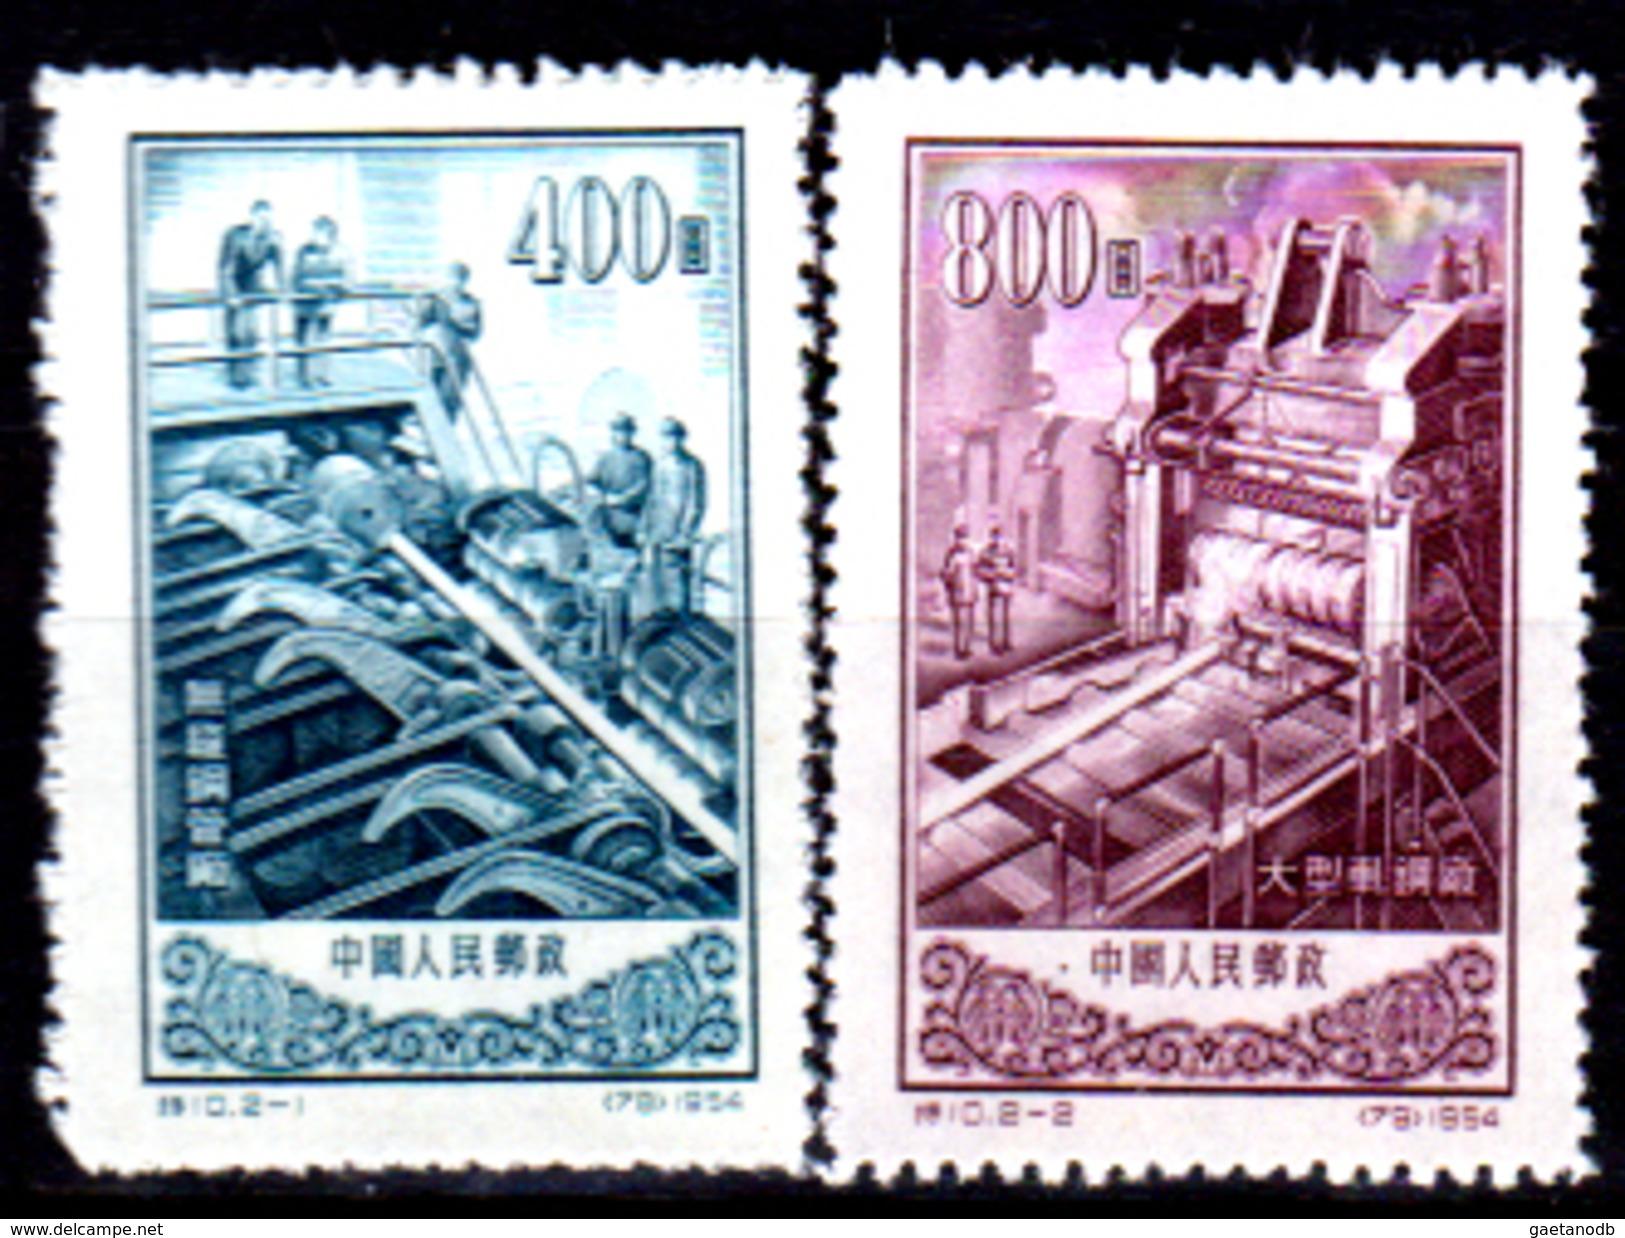 Cina-F-616 - Emissione 1954 - Senza Difetti Occulti. - 1949 - ... People's Republic